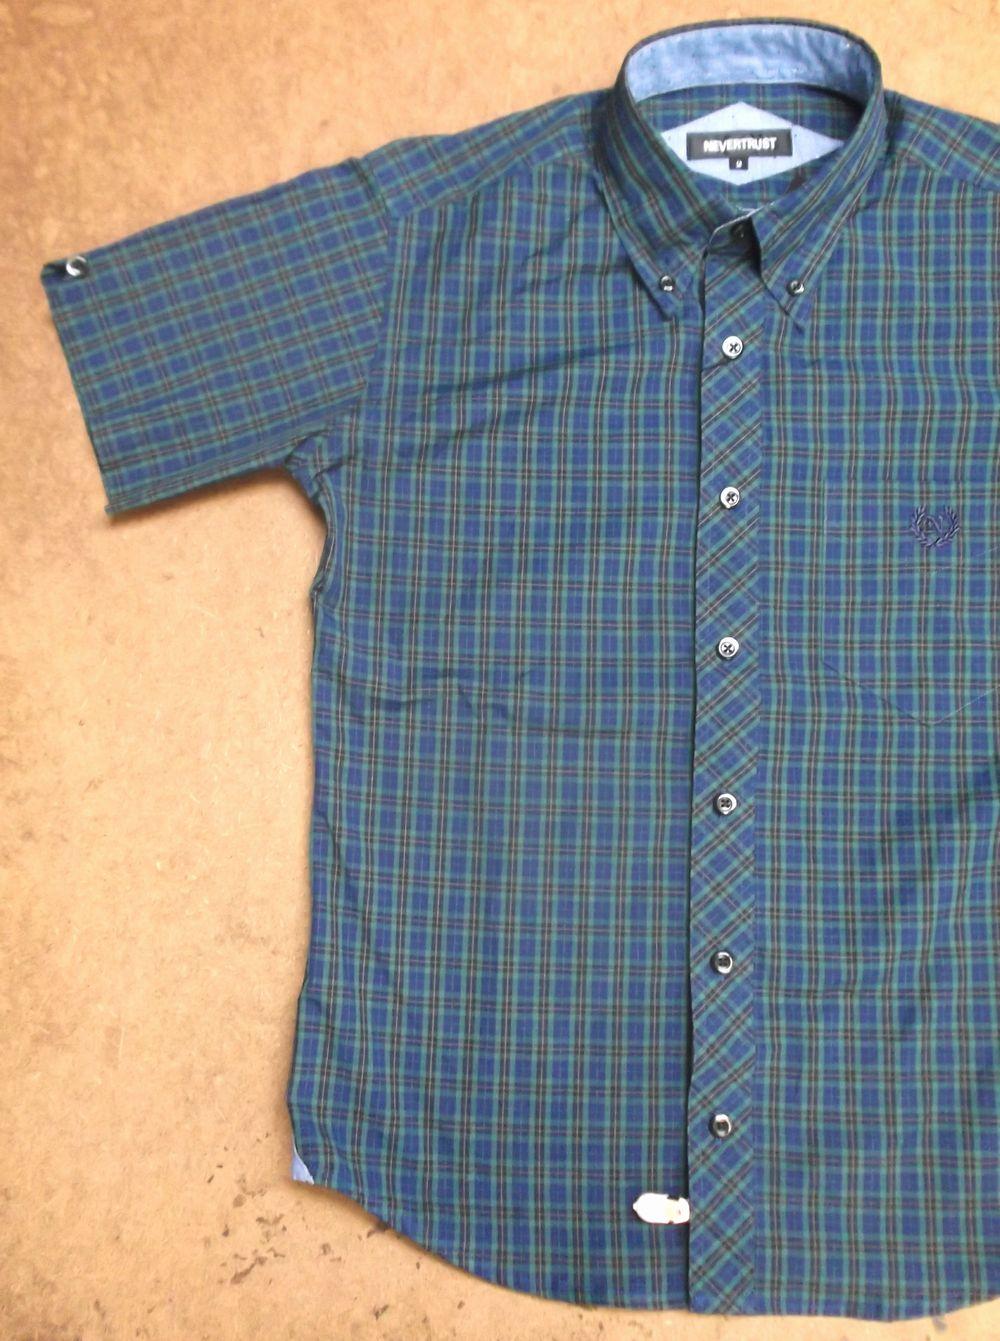 shirt291-3